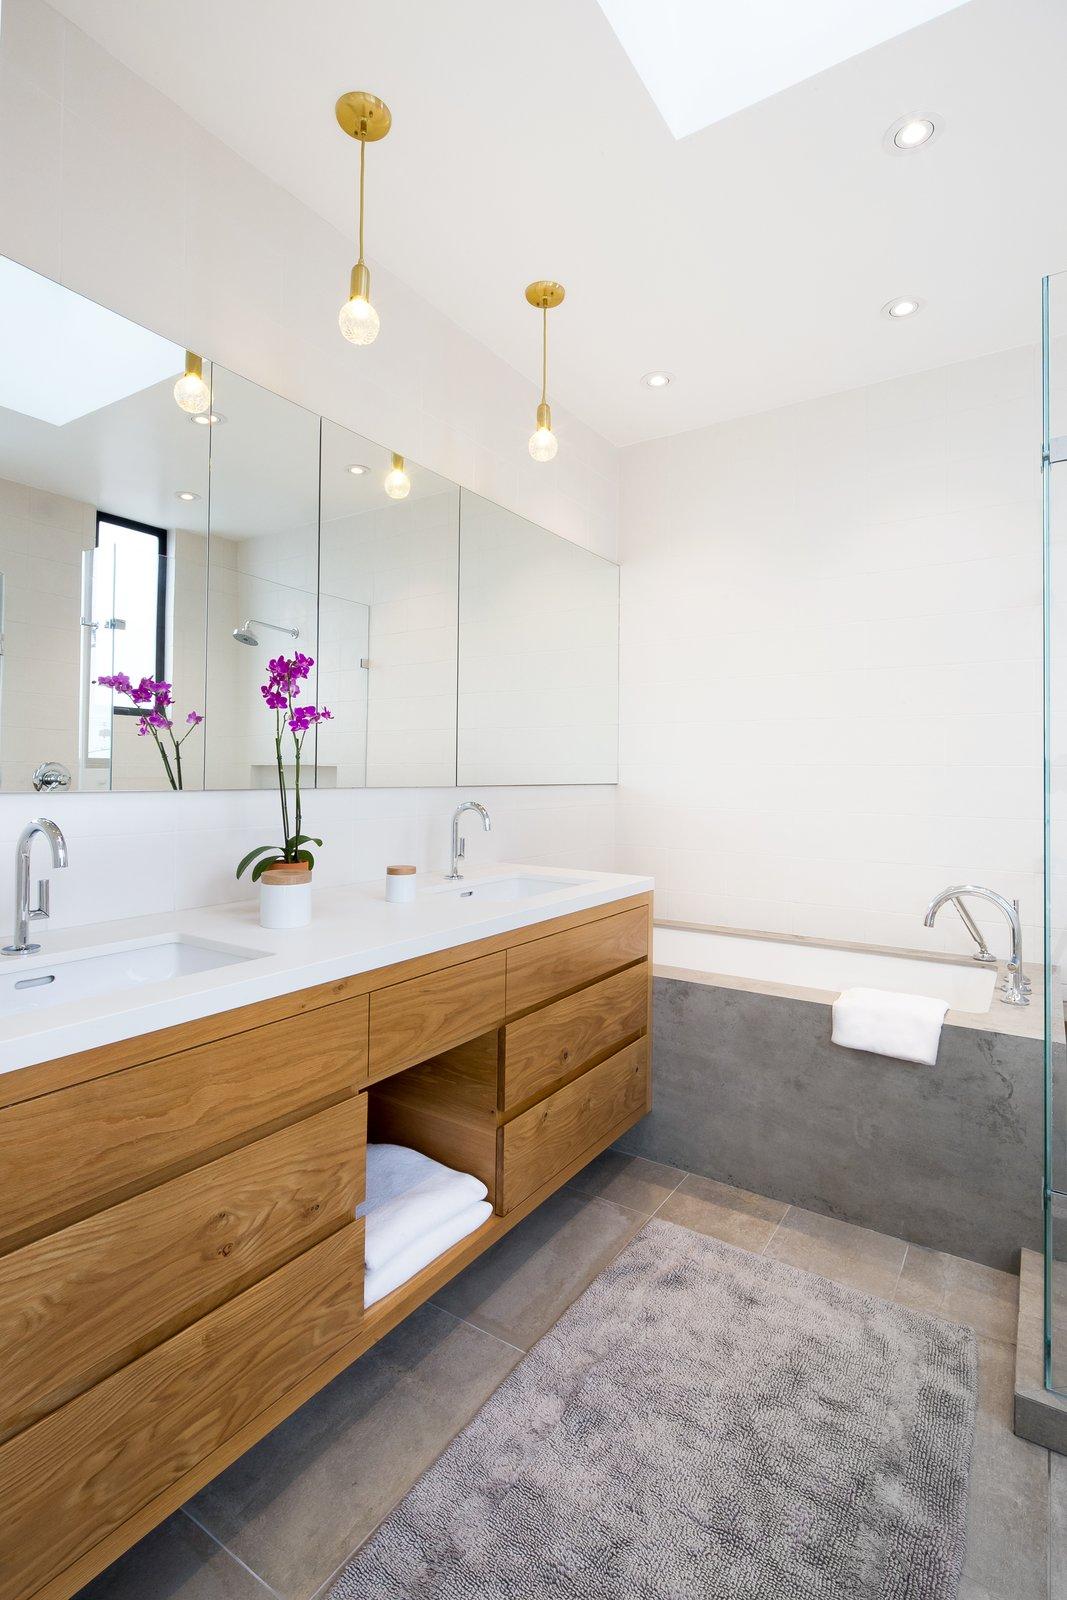 Bath Room and Concrete Floor Master bath  27th Street - Noe Valley by patrick perez/designpad architecture